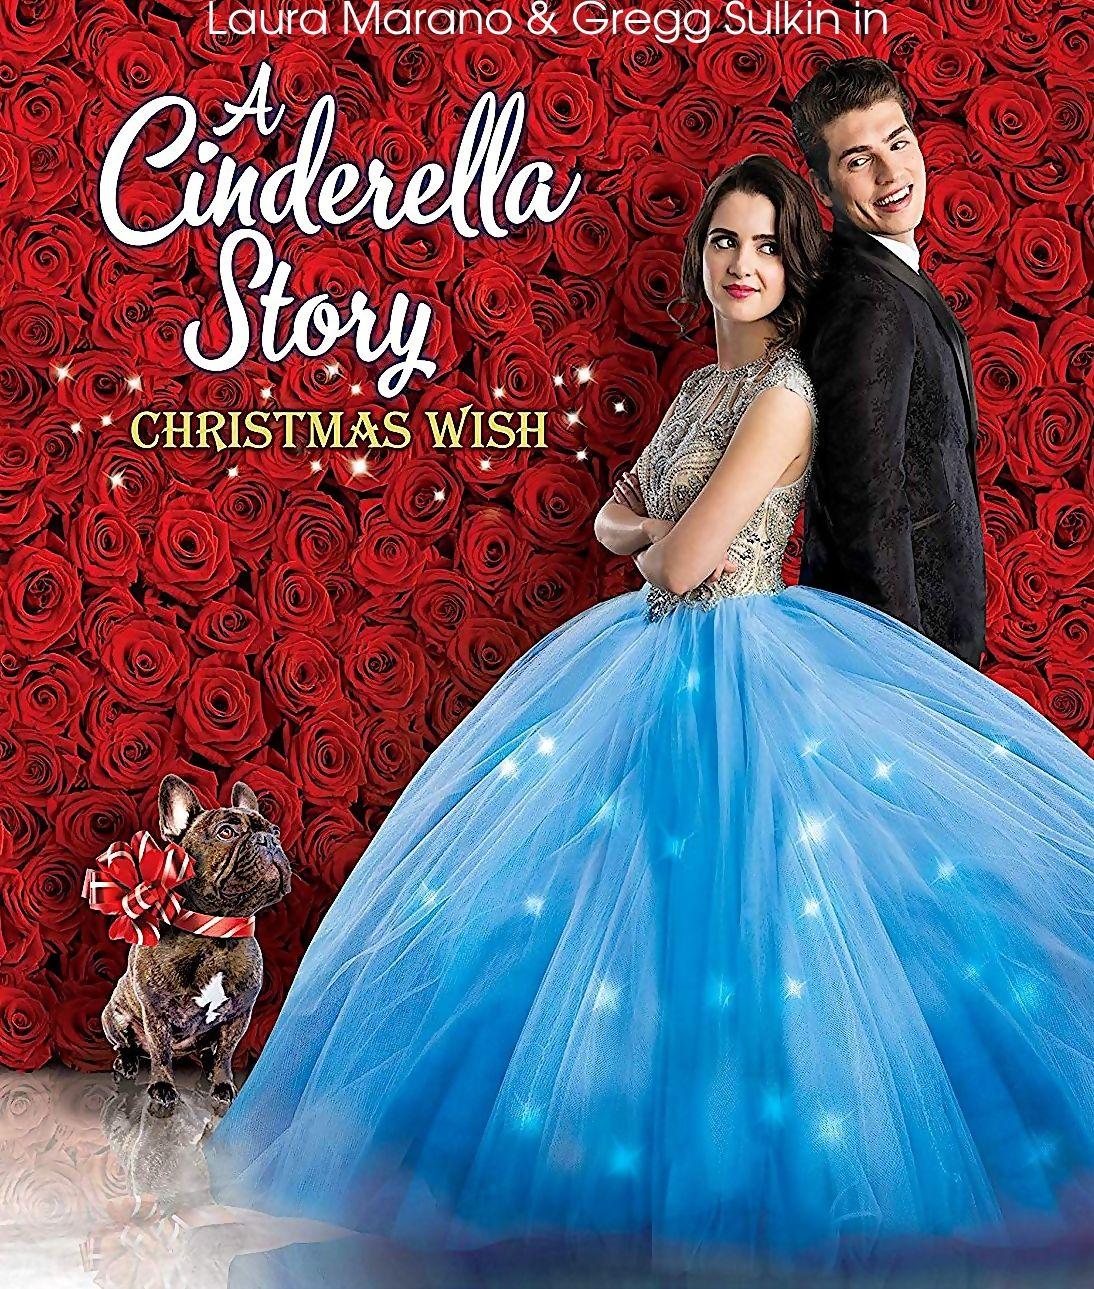 A Cinderella Story Christmas Wish 2019 A Cinderella Story Cinderella Cinderella Story Movies